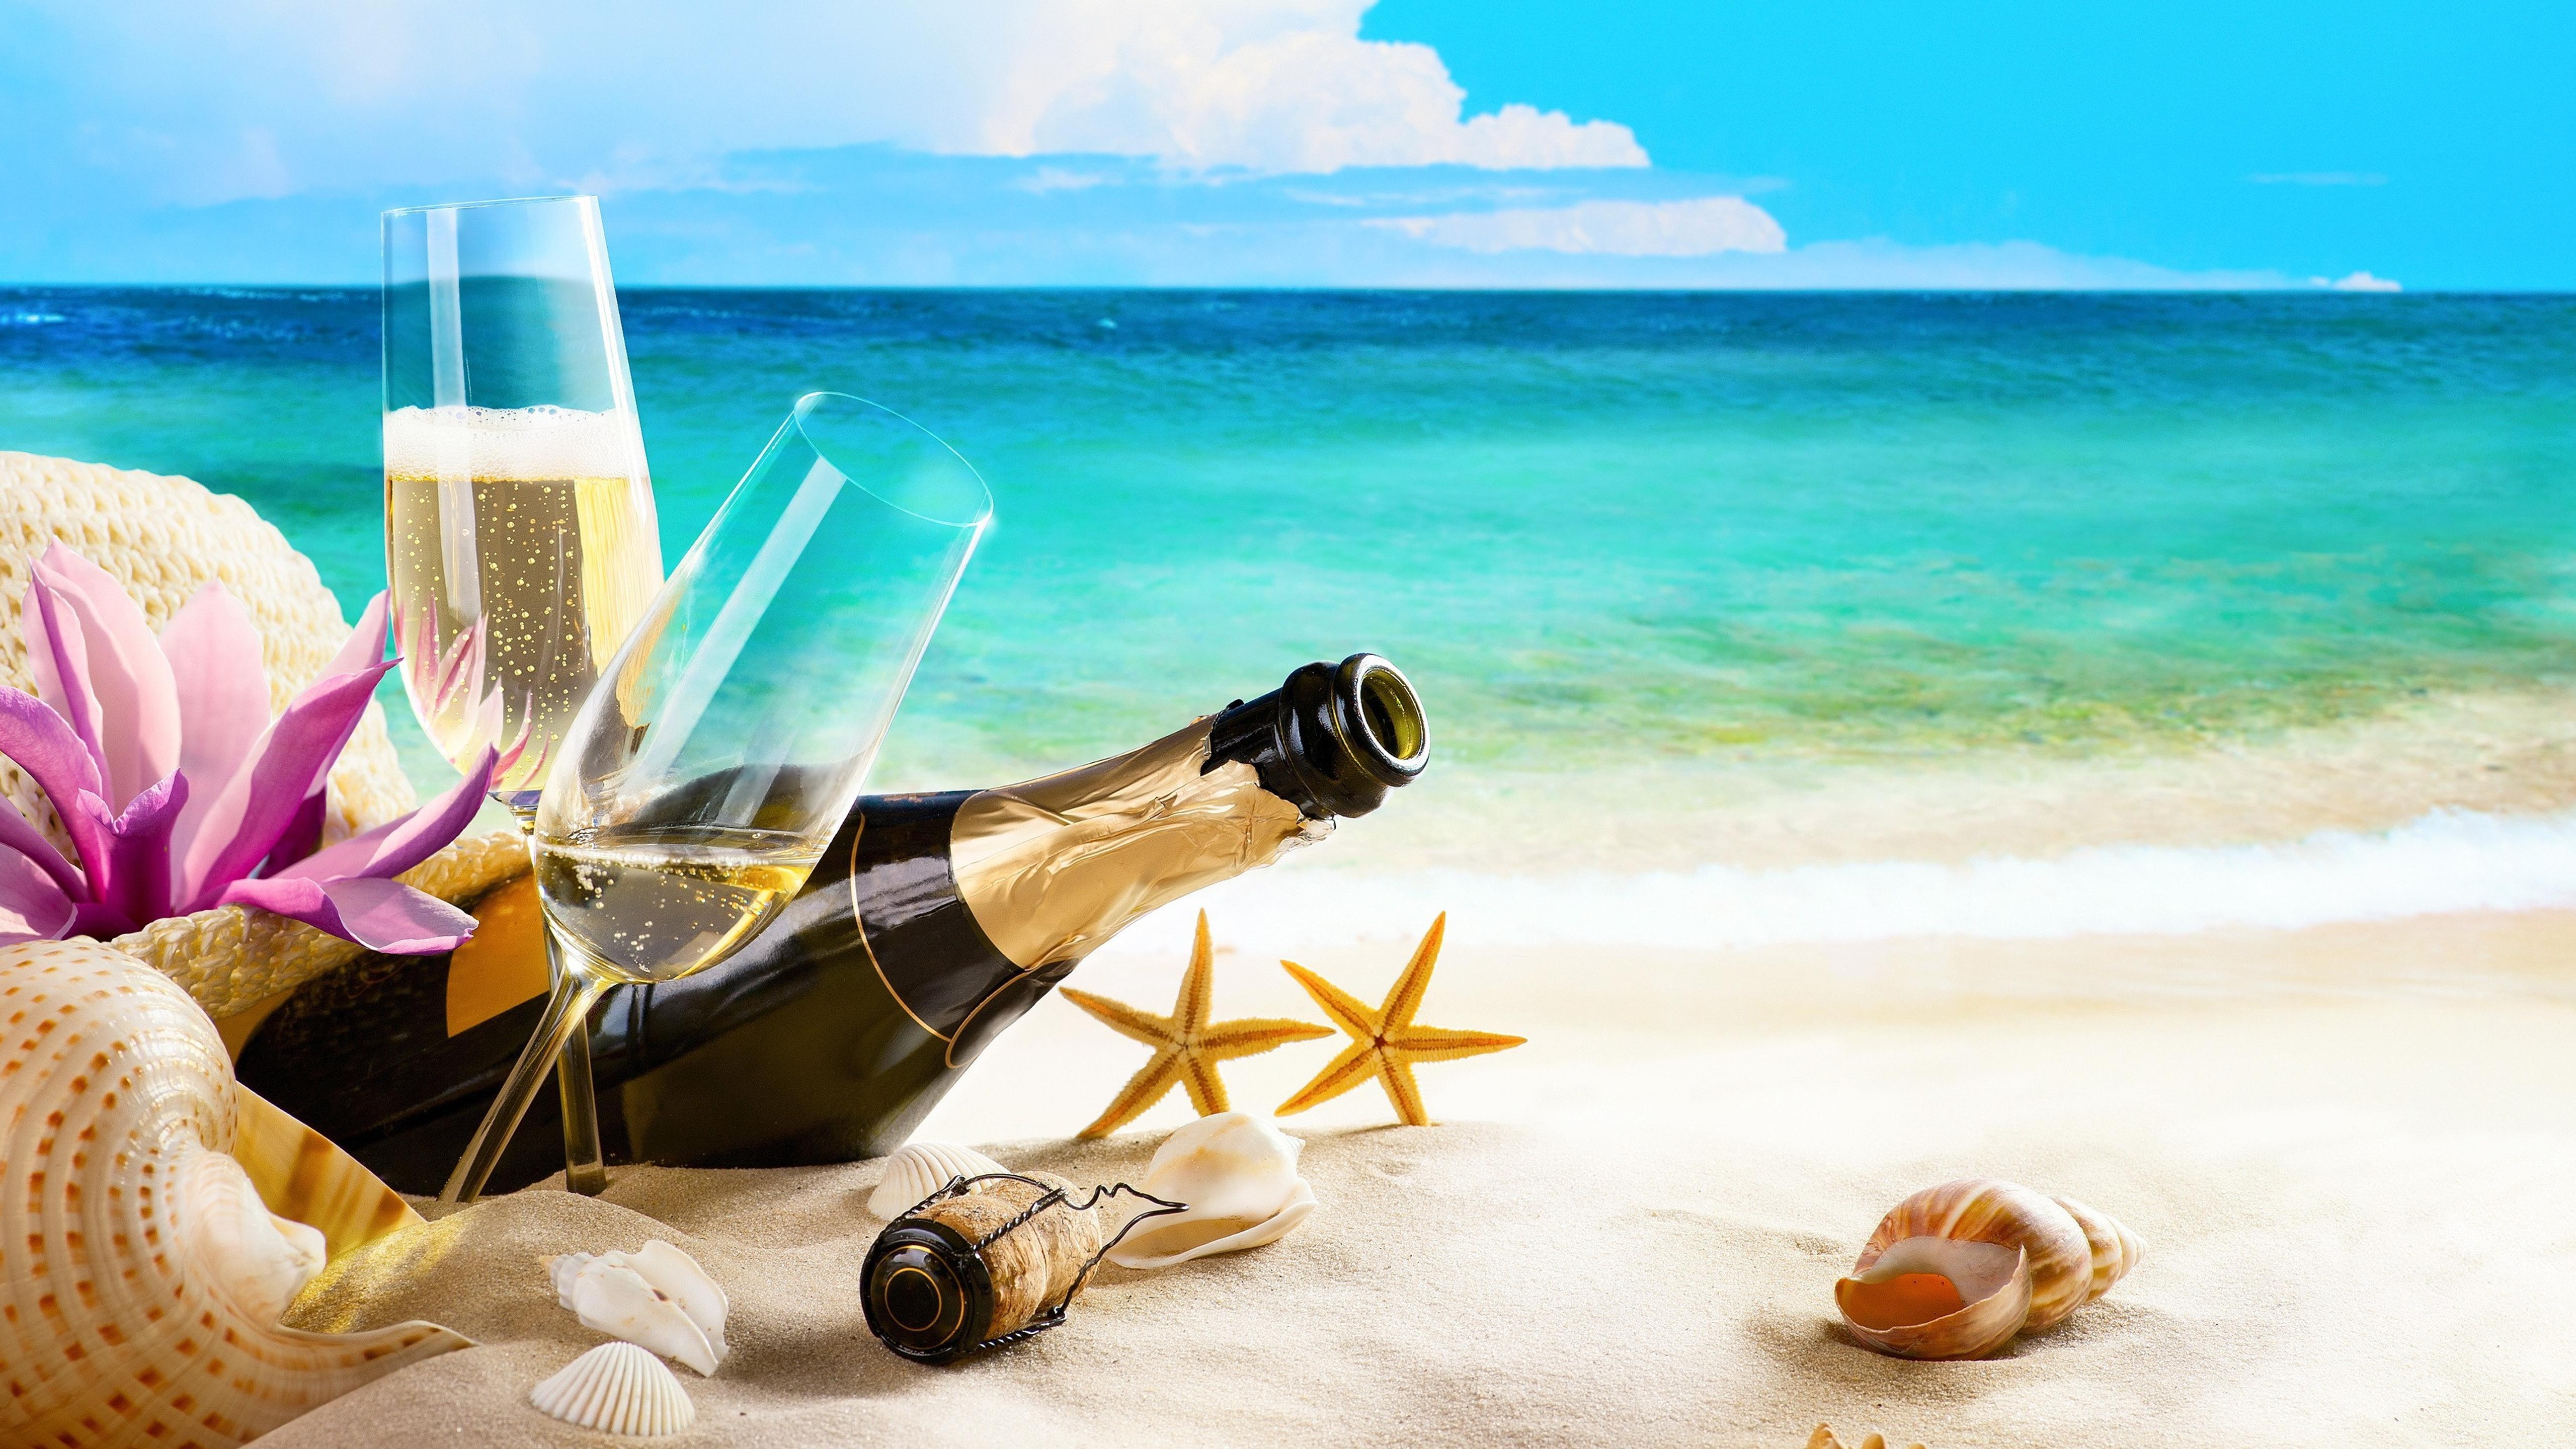 Поздравления с морем и солнцем 925